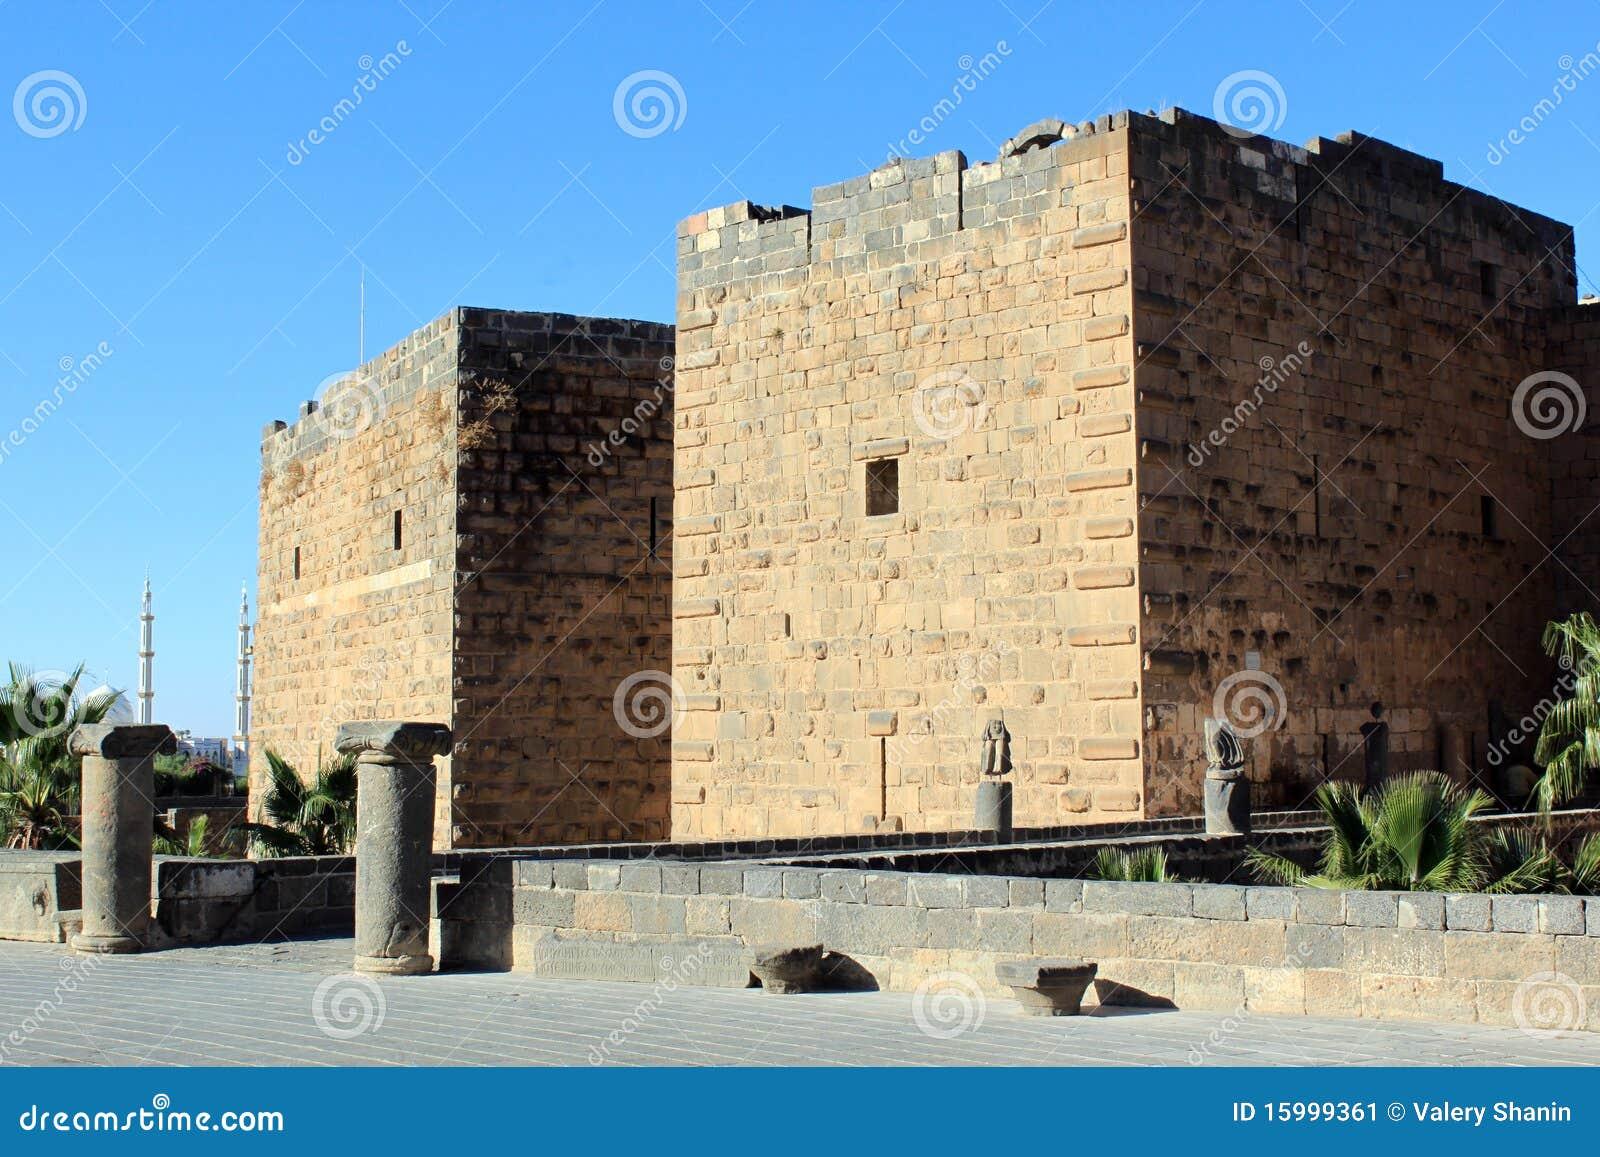 Zitadelle